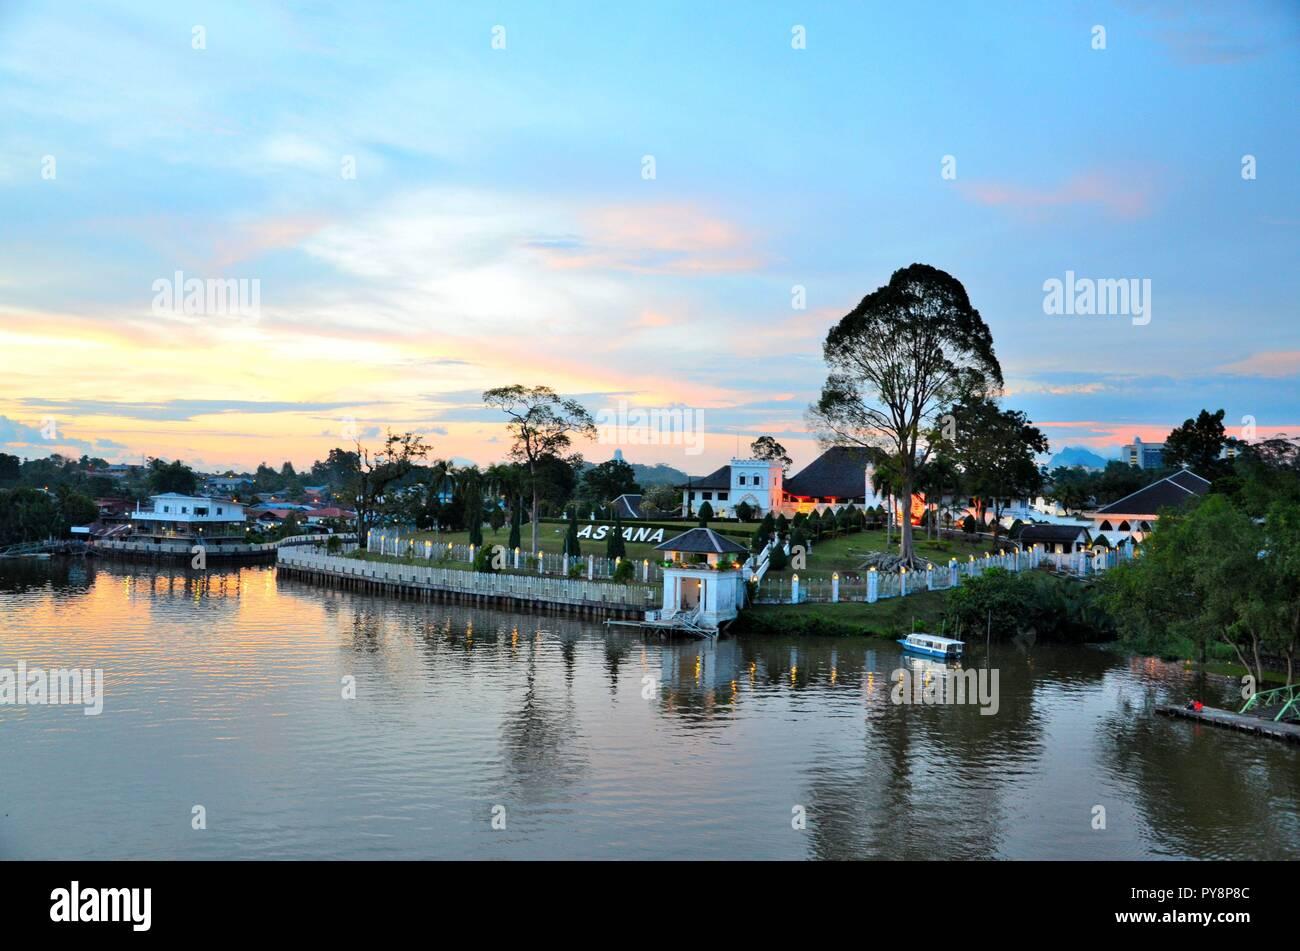 Sarawak astana palazzo del governatore mansion su Sarawak Riverwaterfront Kuching Malesia orientale Foto Stock